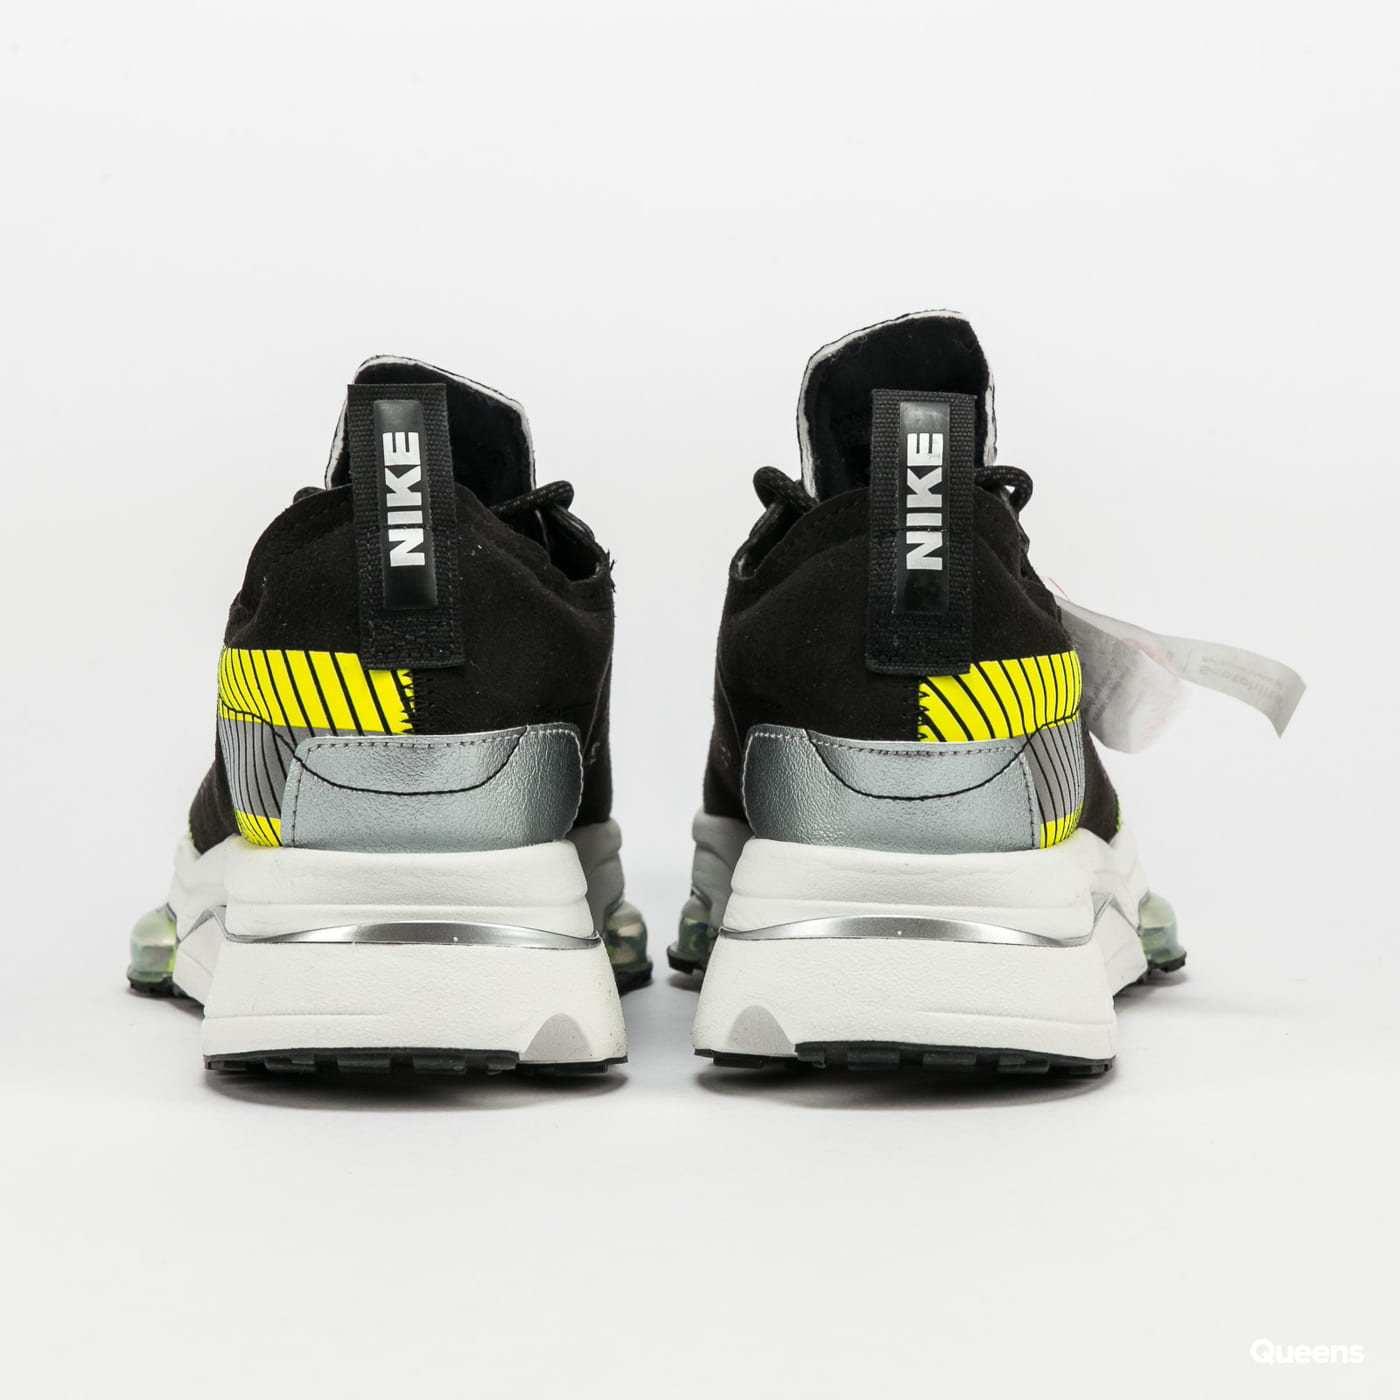 Nike Air Zoom - Type SE 3M black / anthracite - summit white